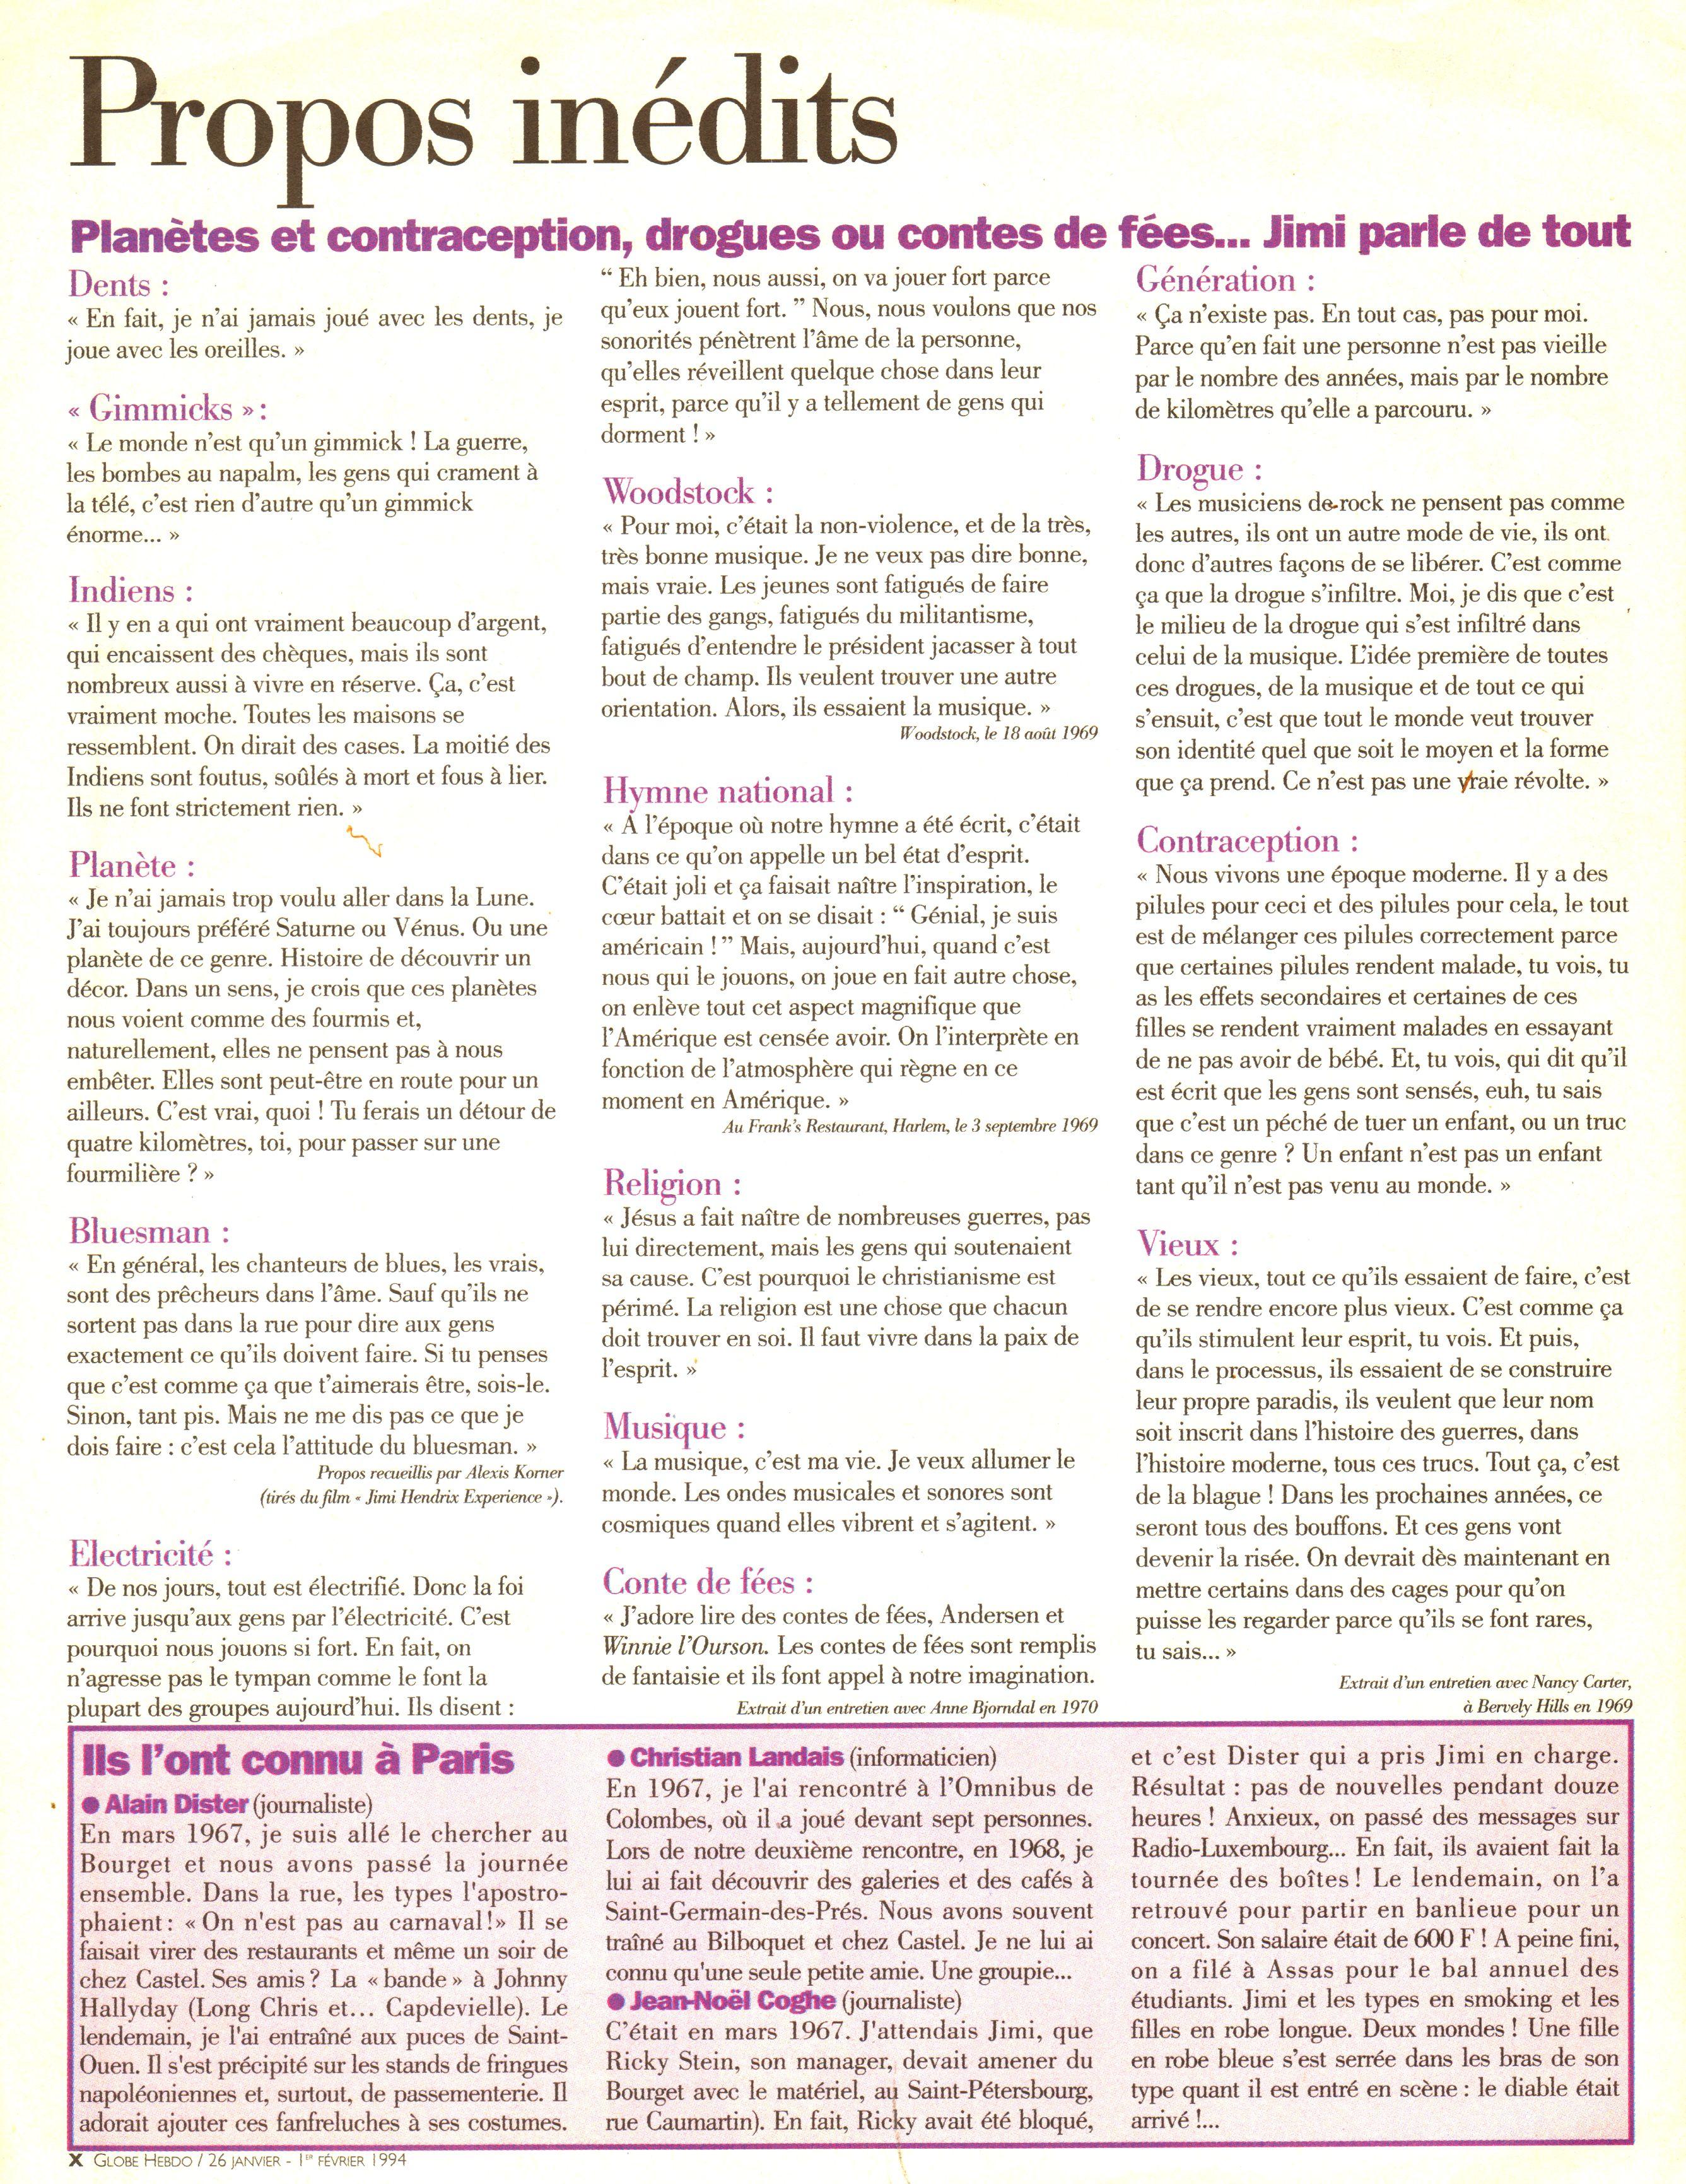 Magazines Français 1989 - 2014 GlobeHebdo26Janvier1reFevrier1994Page10